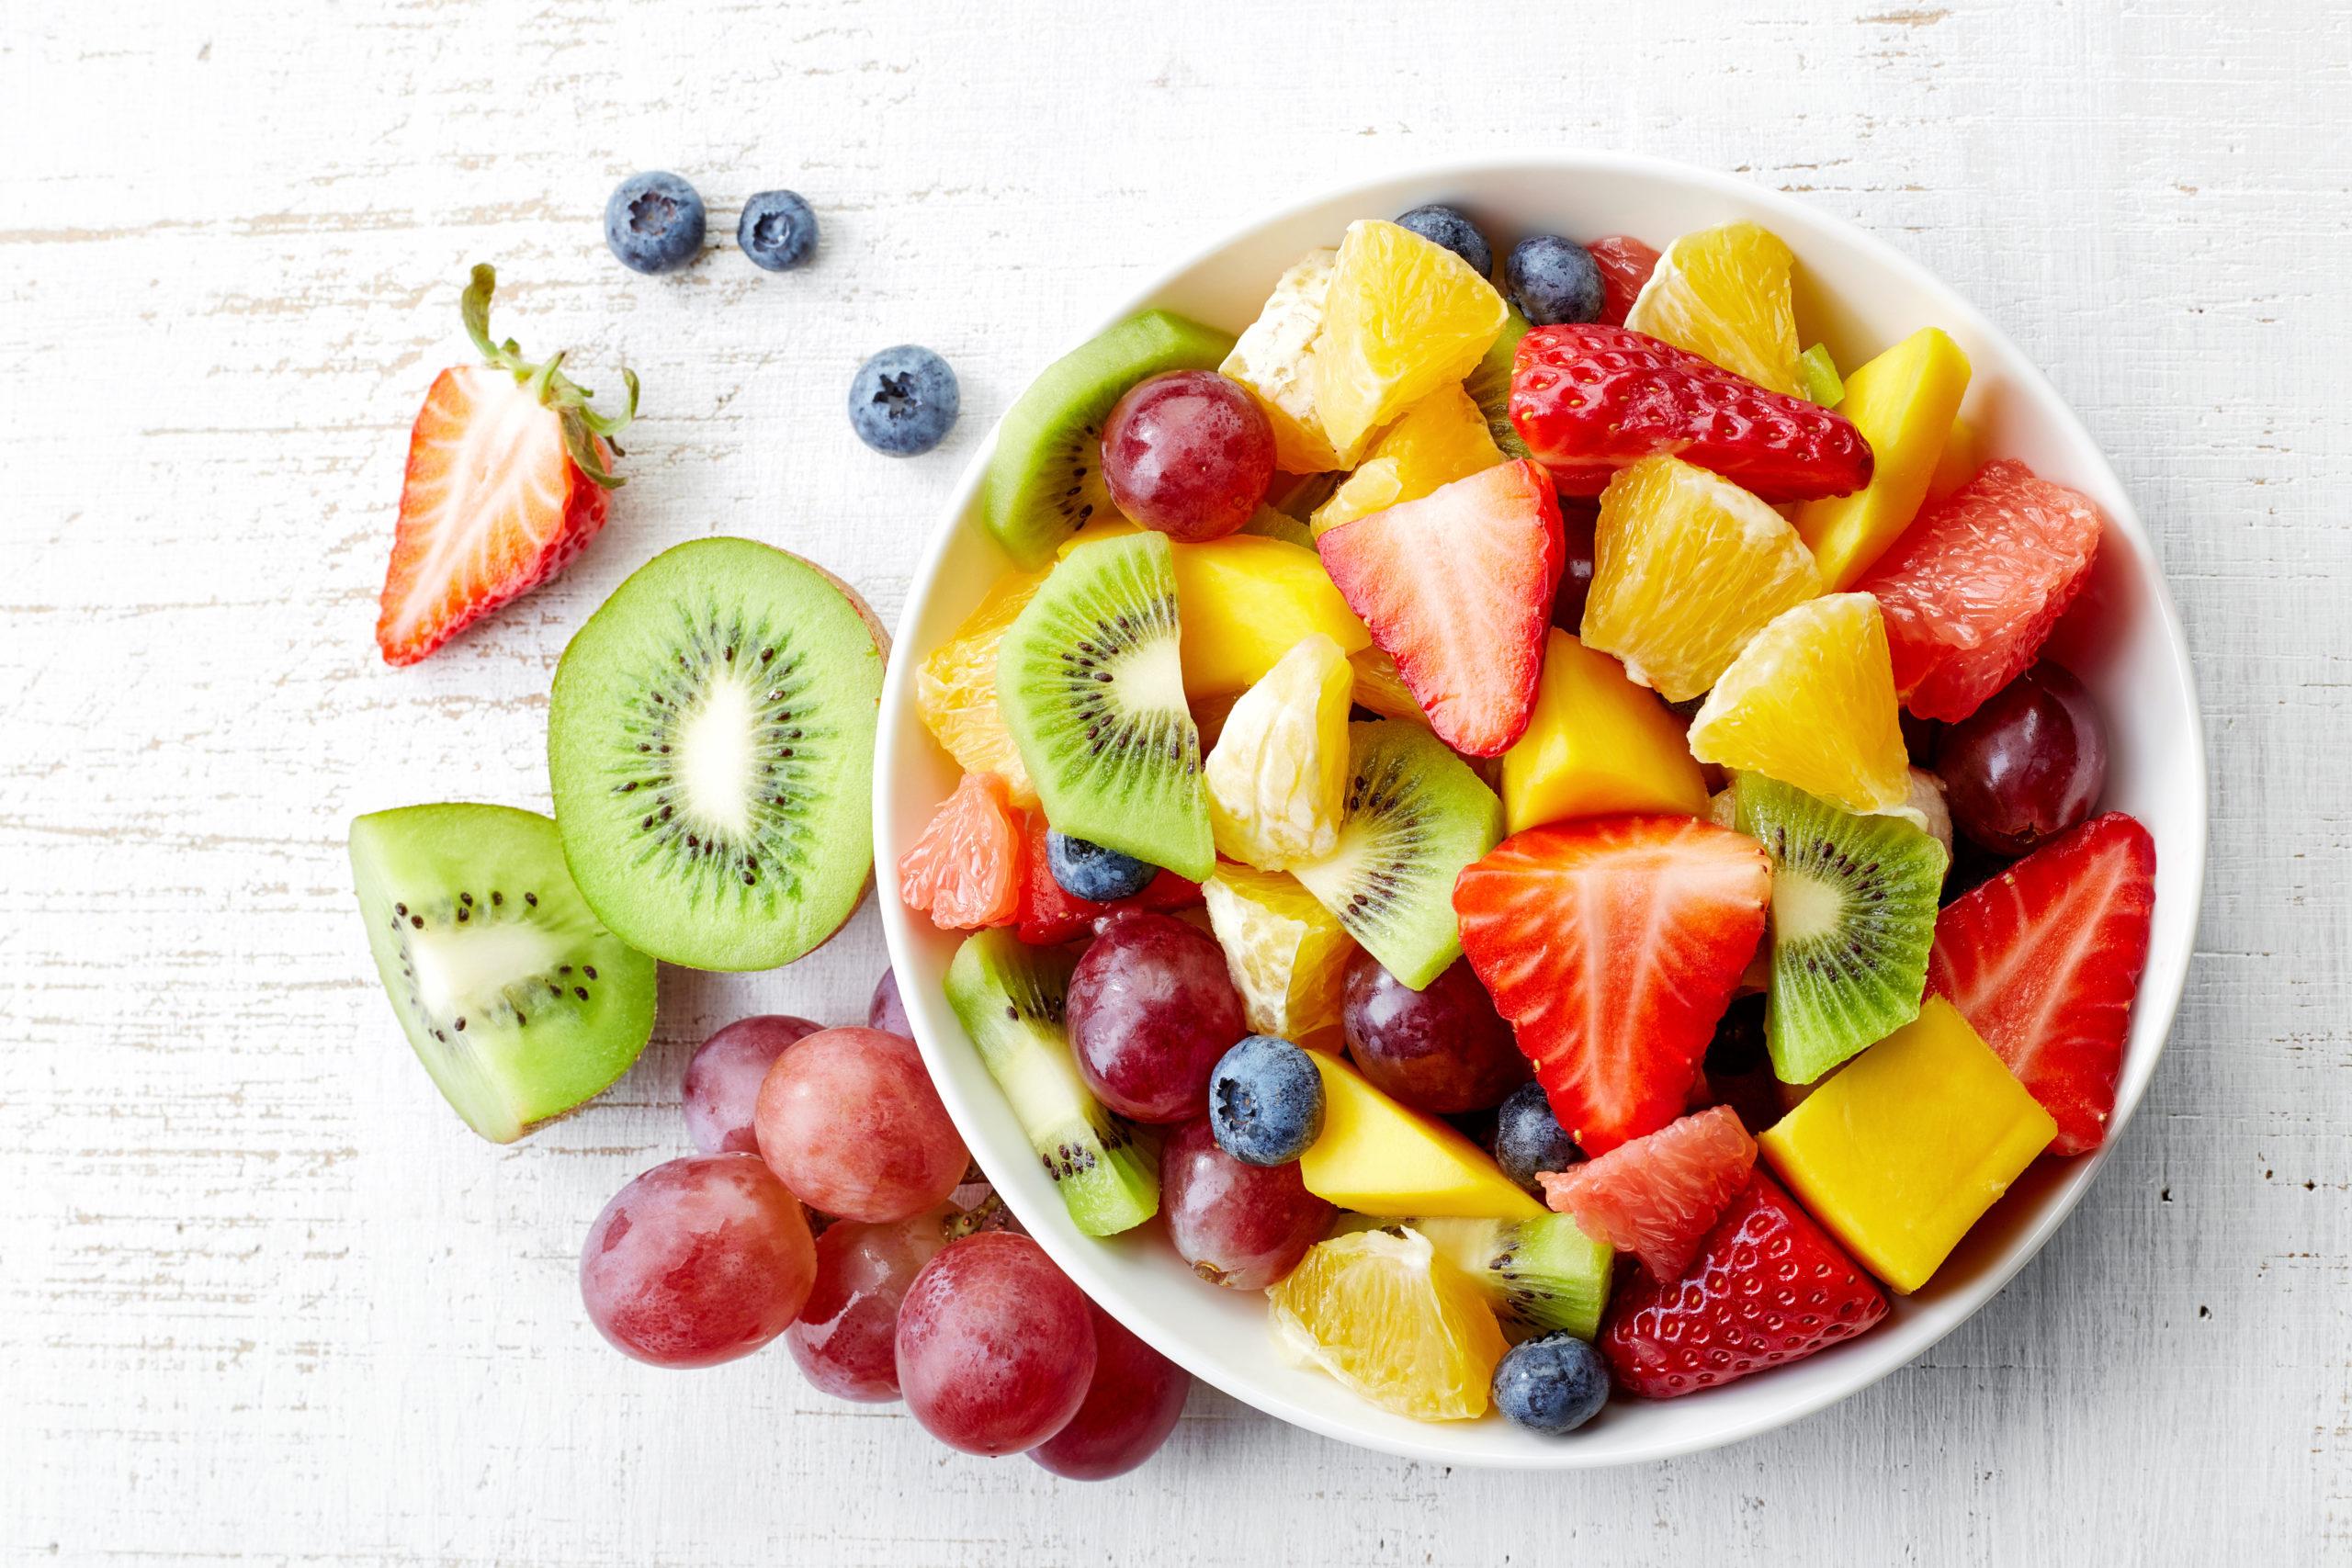 Fructoseintoleranz